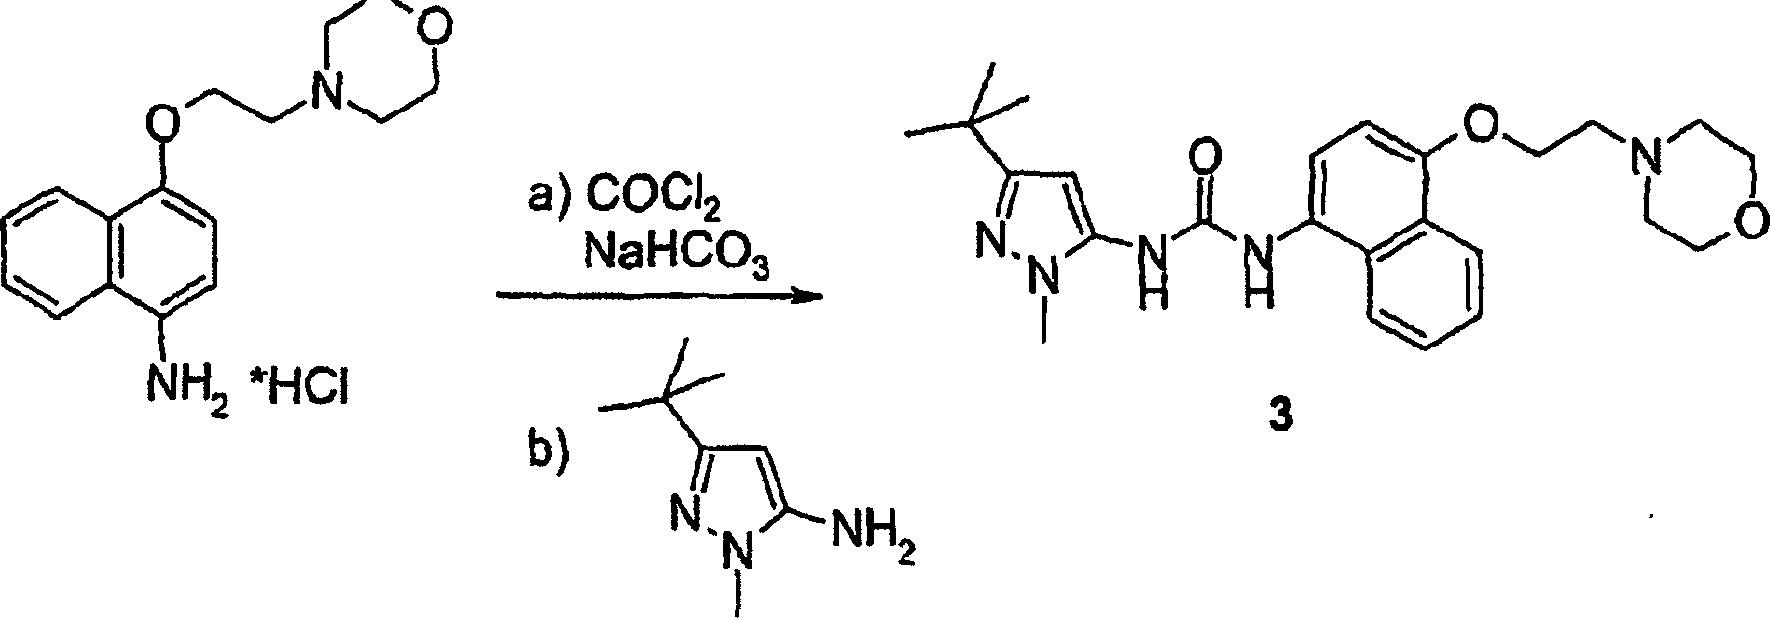 DE60319066T2 - 1,4-disubstituted benzo-fused cycloalkyl urea